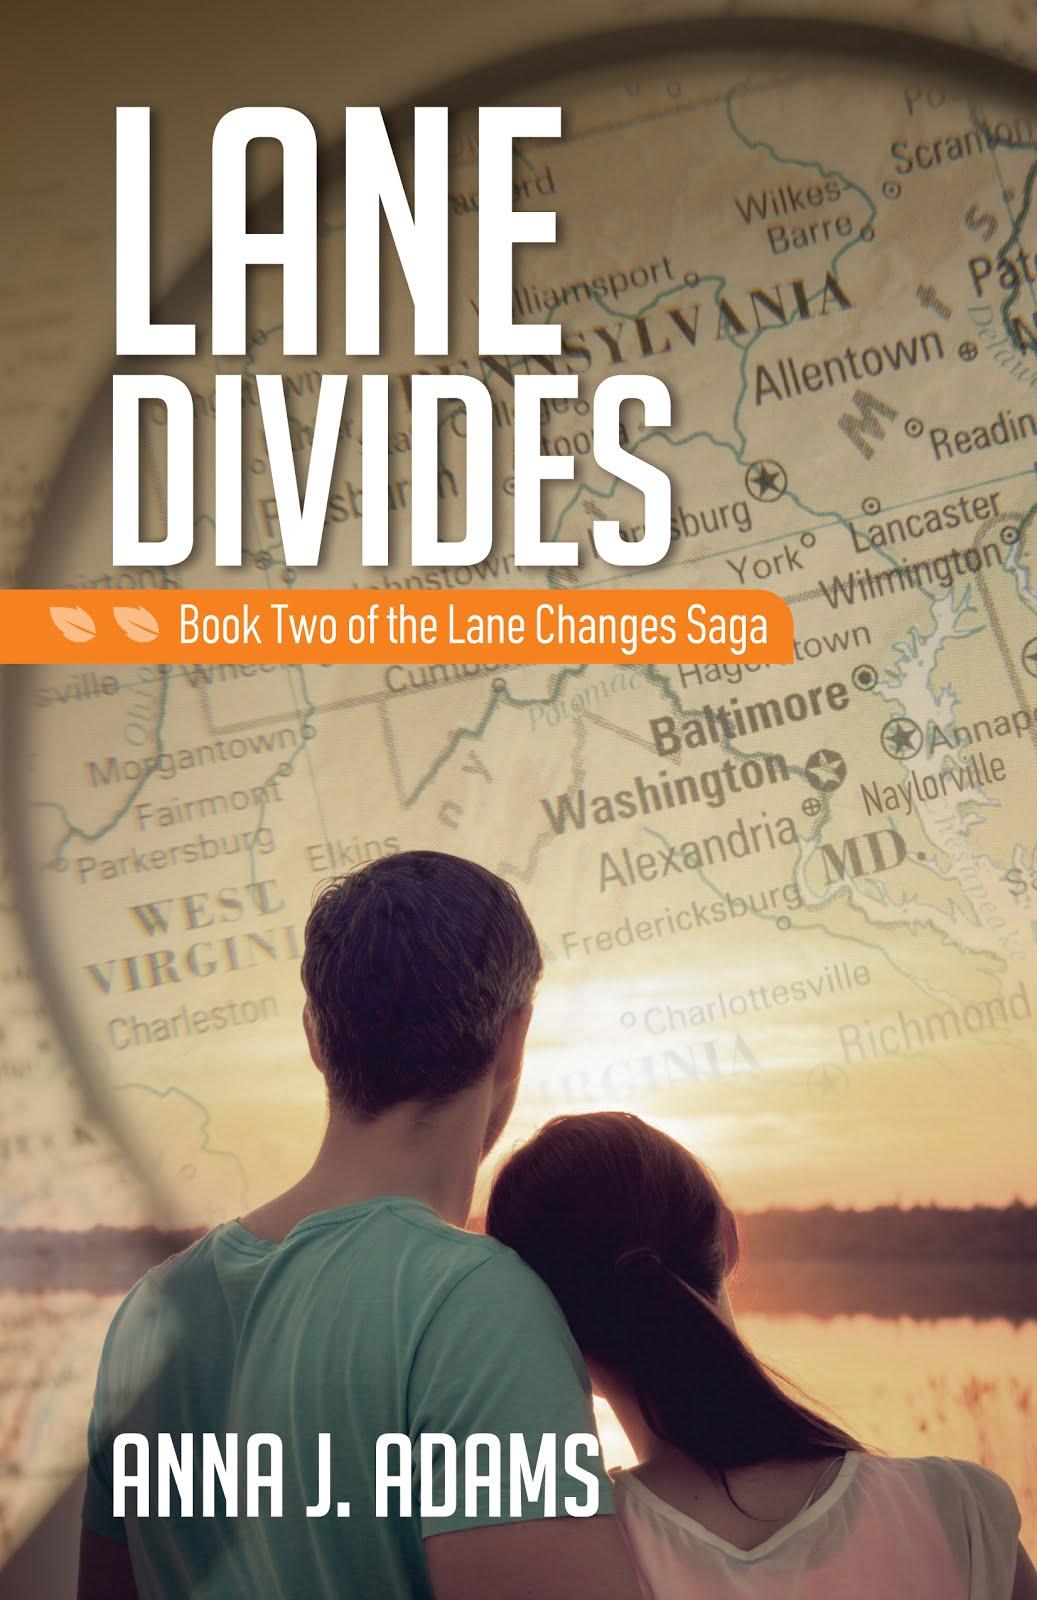 Lane Divides